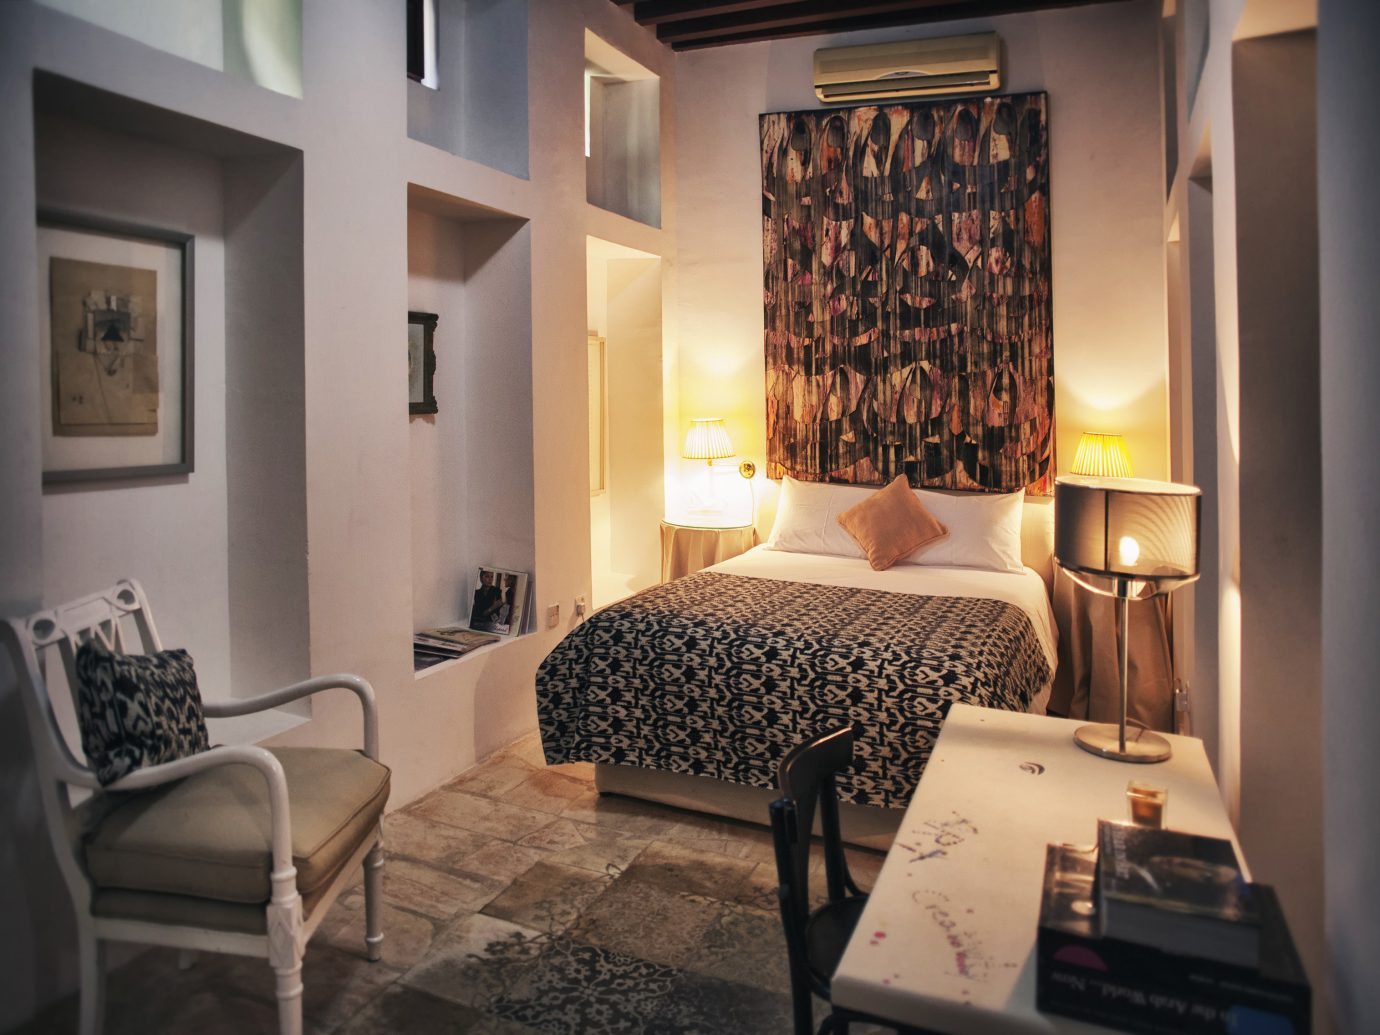 Dubai Hotels Luxury Travel Middle East indoor wall floor room interior design Suite ceiling Bedroom furniture home interior designer hotel window